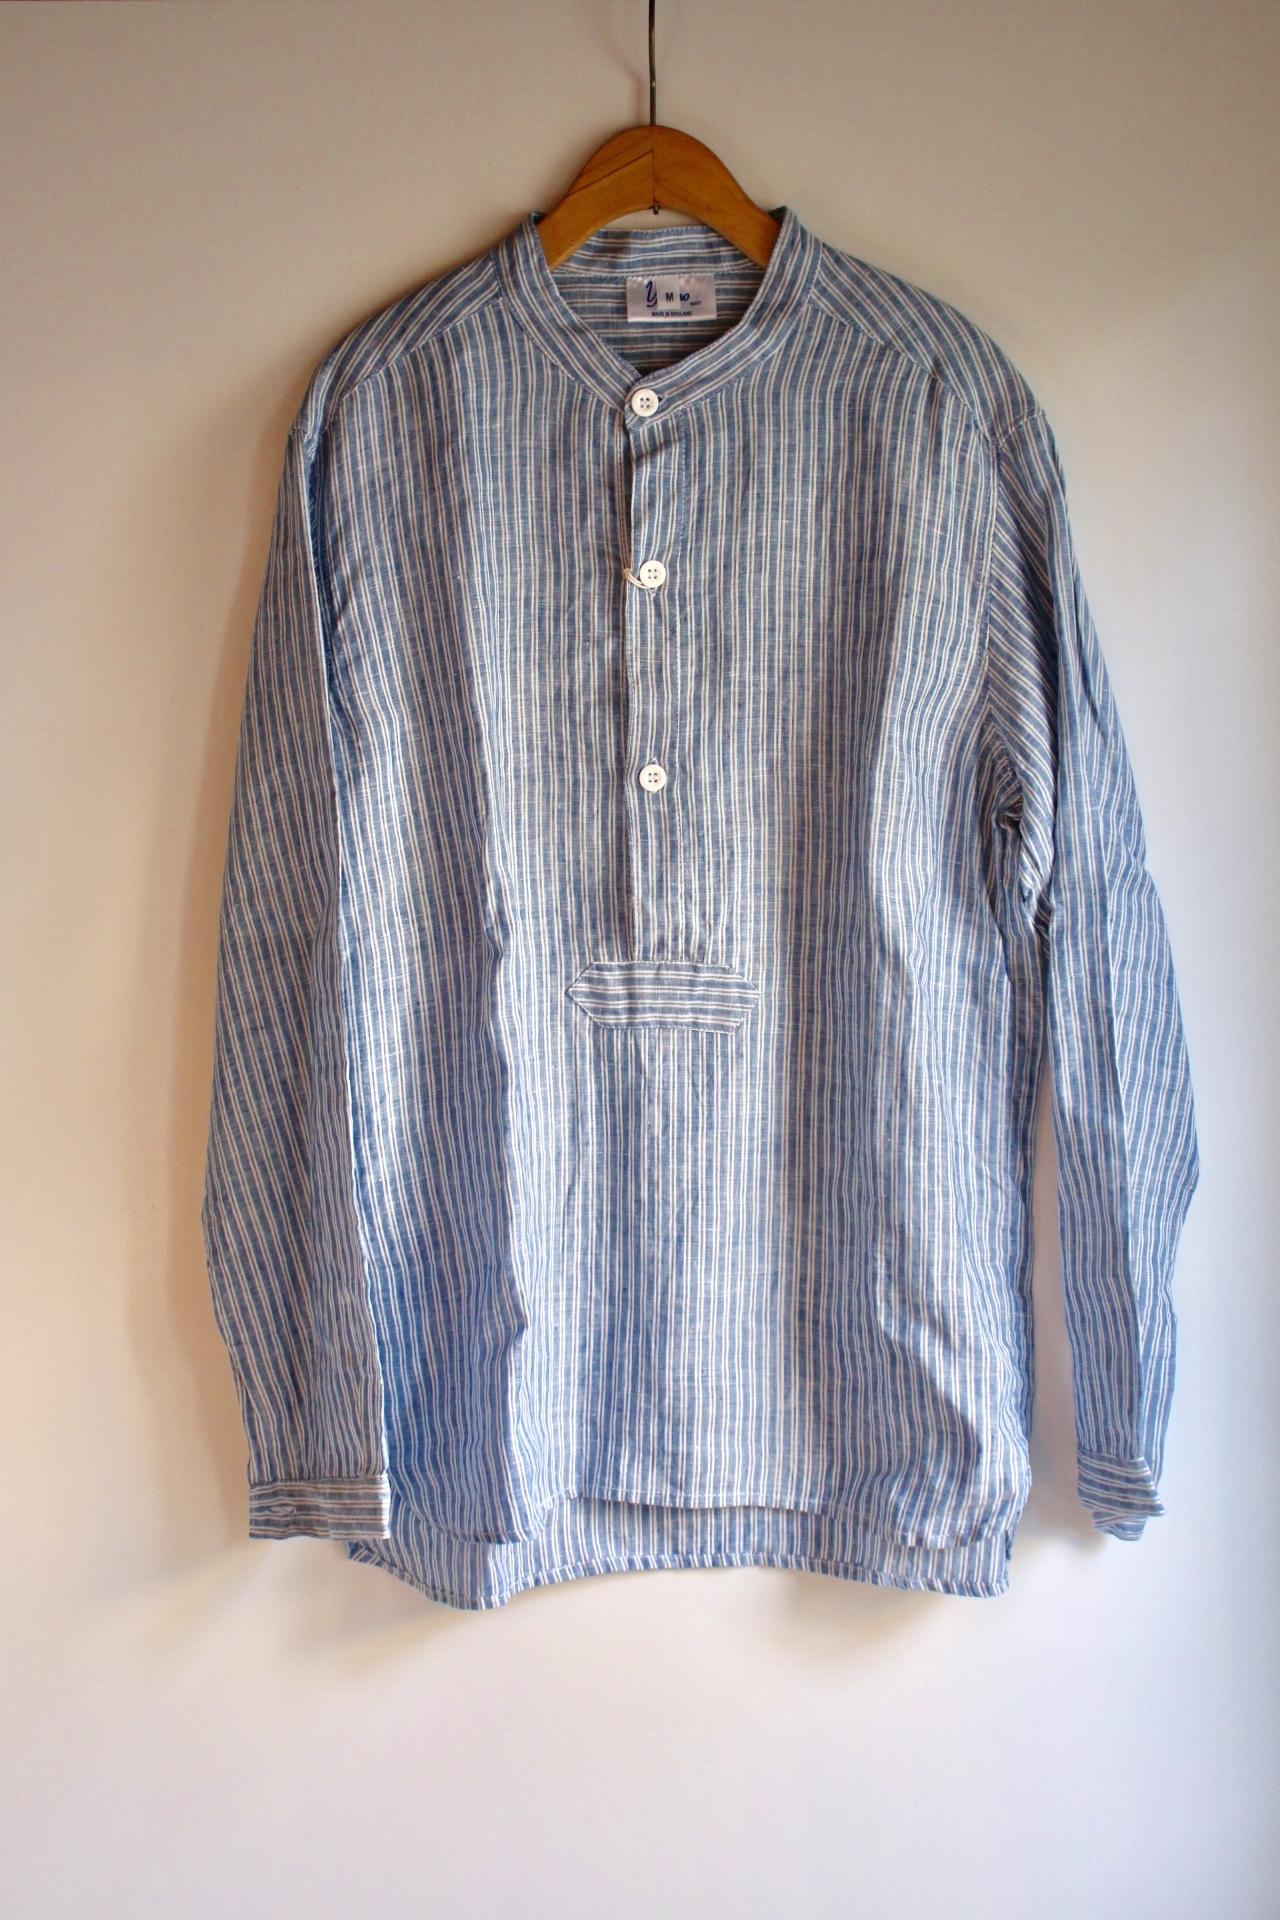 Yarmo(ヤーモ)リネンプルオーバー スタンドカラーシャツ ブルー×ホワイトストライプ メンズ